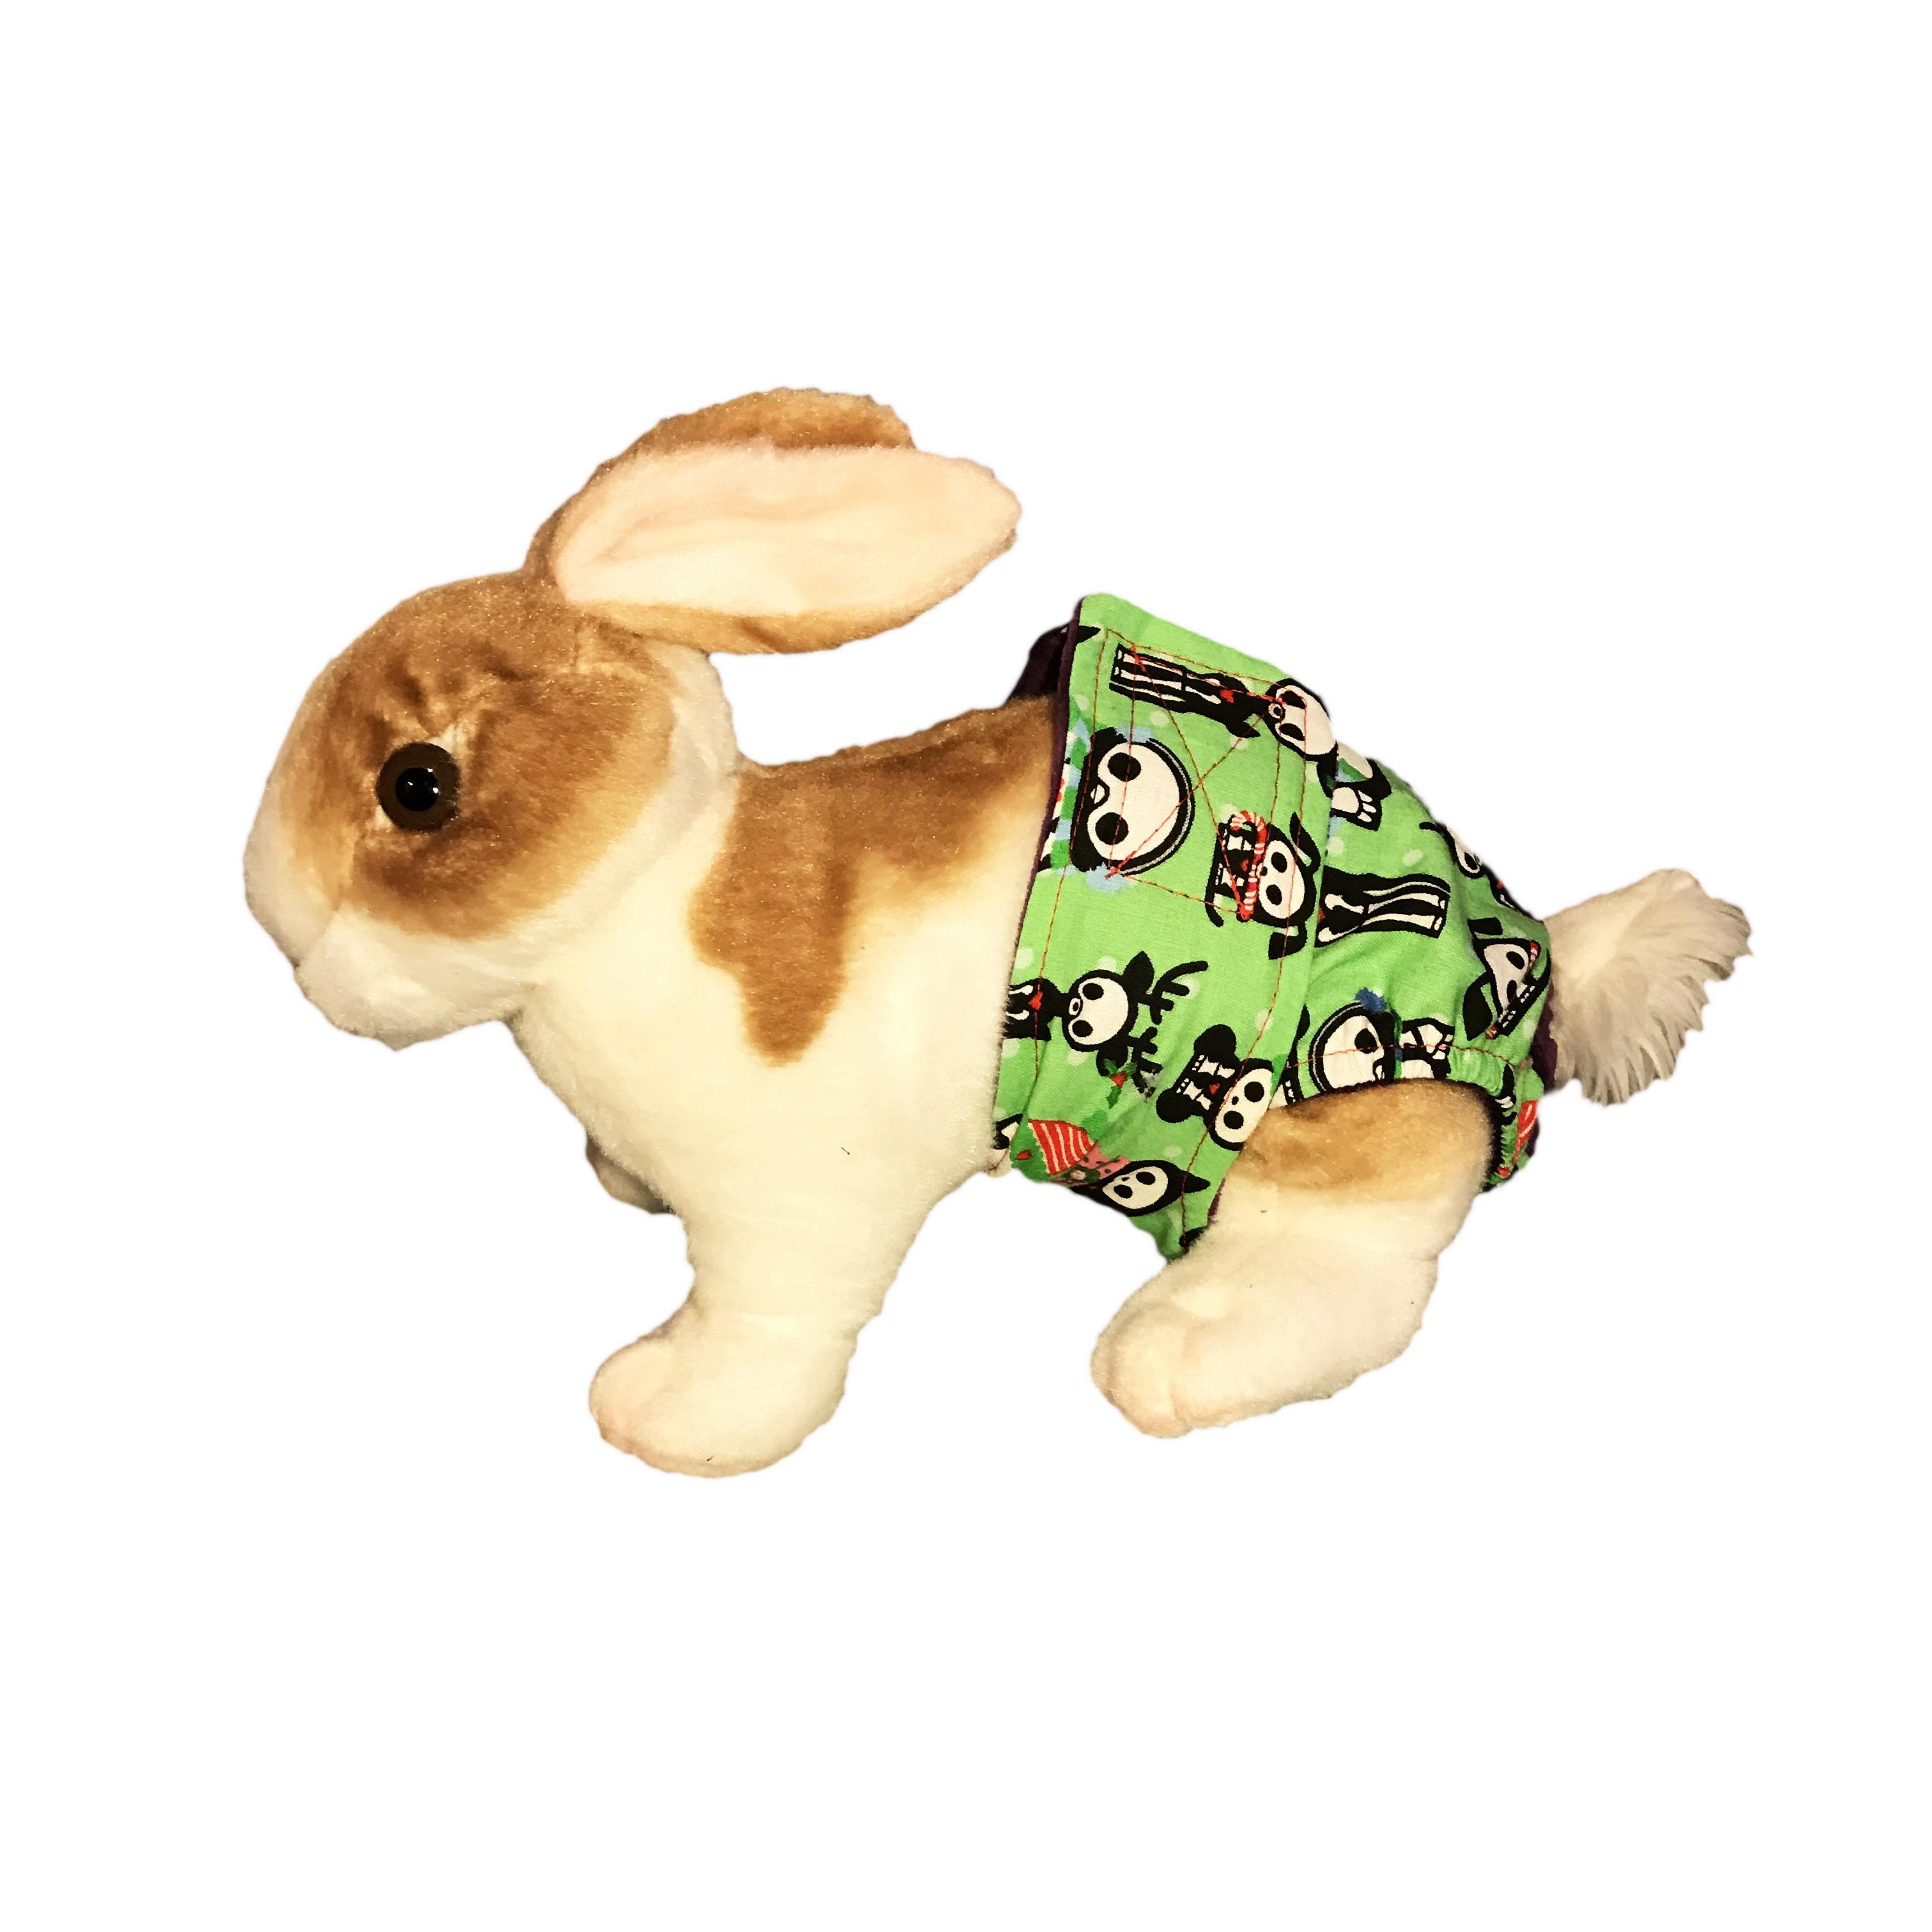 Christmas Skeleton.Christmas Skeleton Figures On Green Washable Bunny Diaper